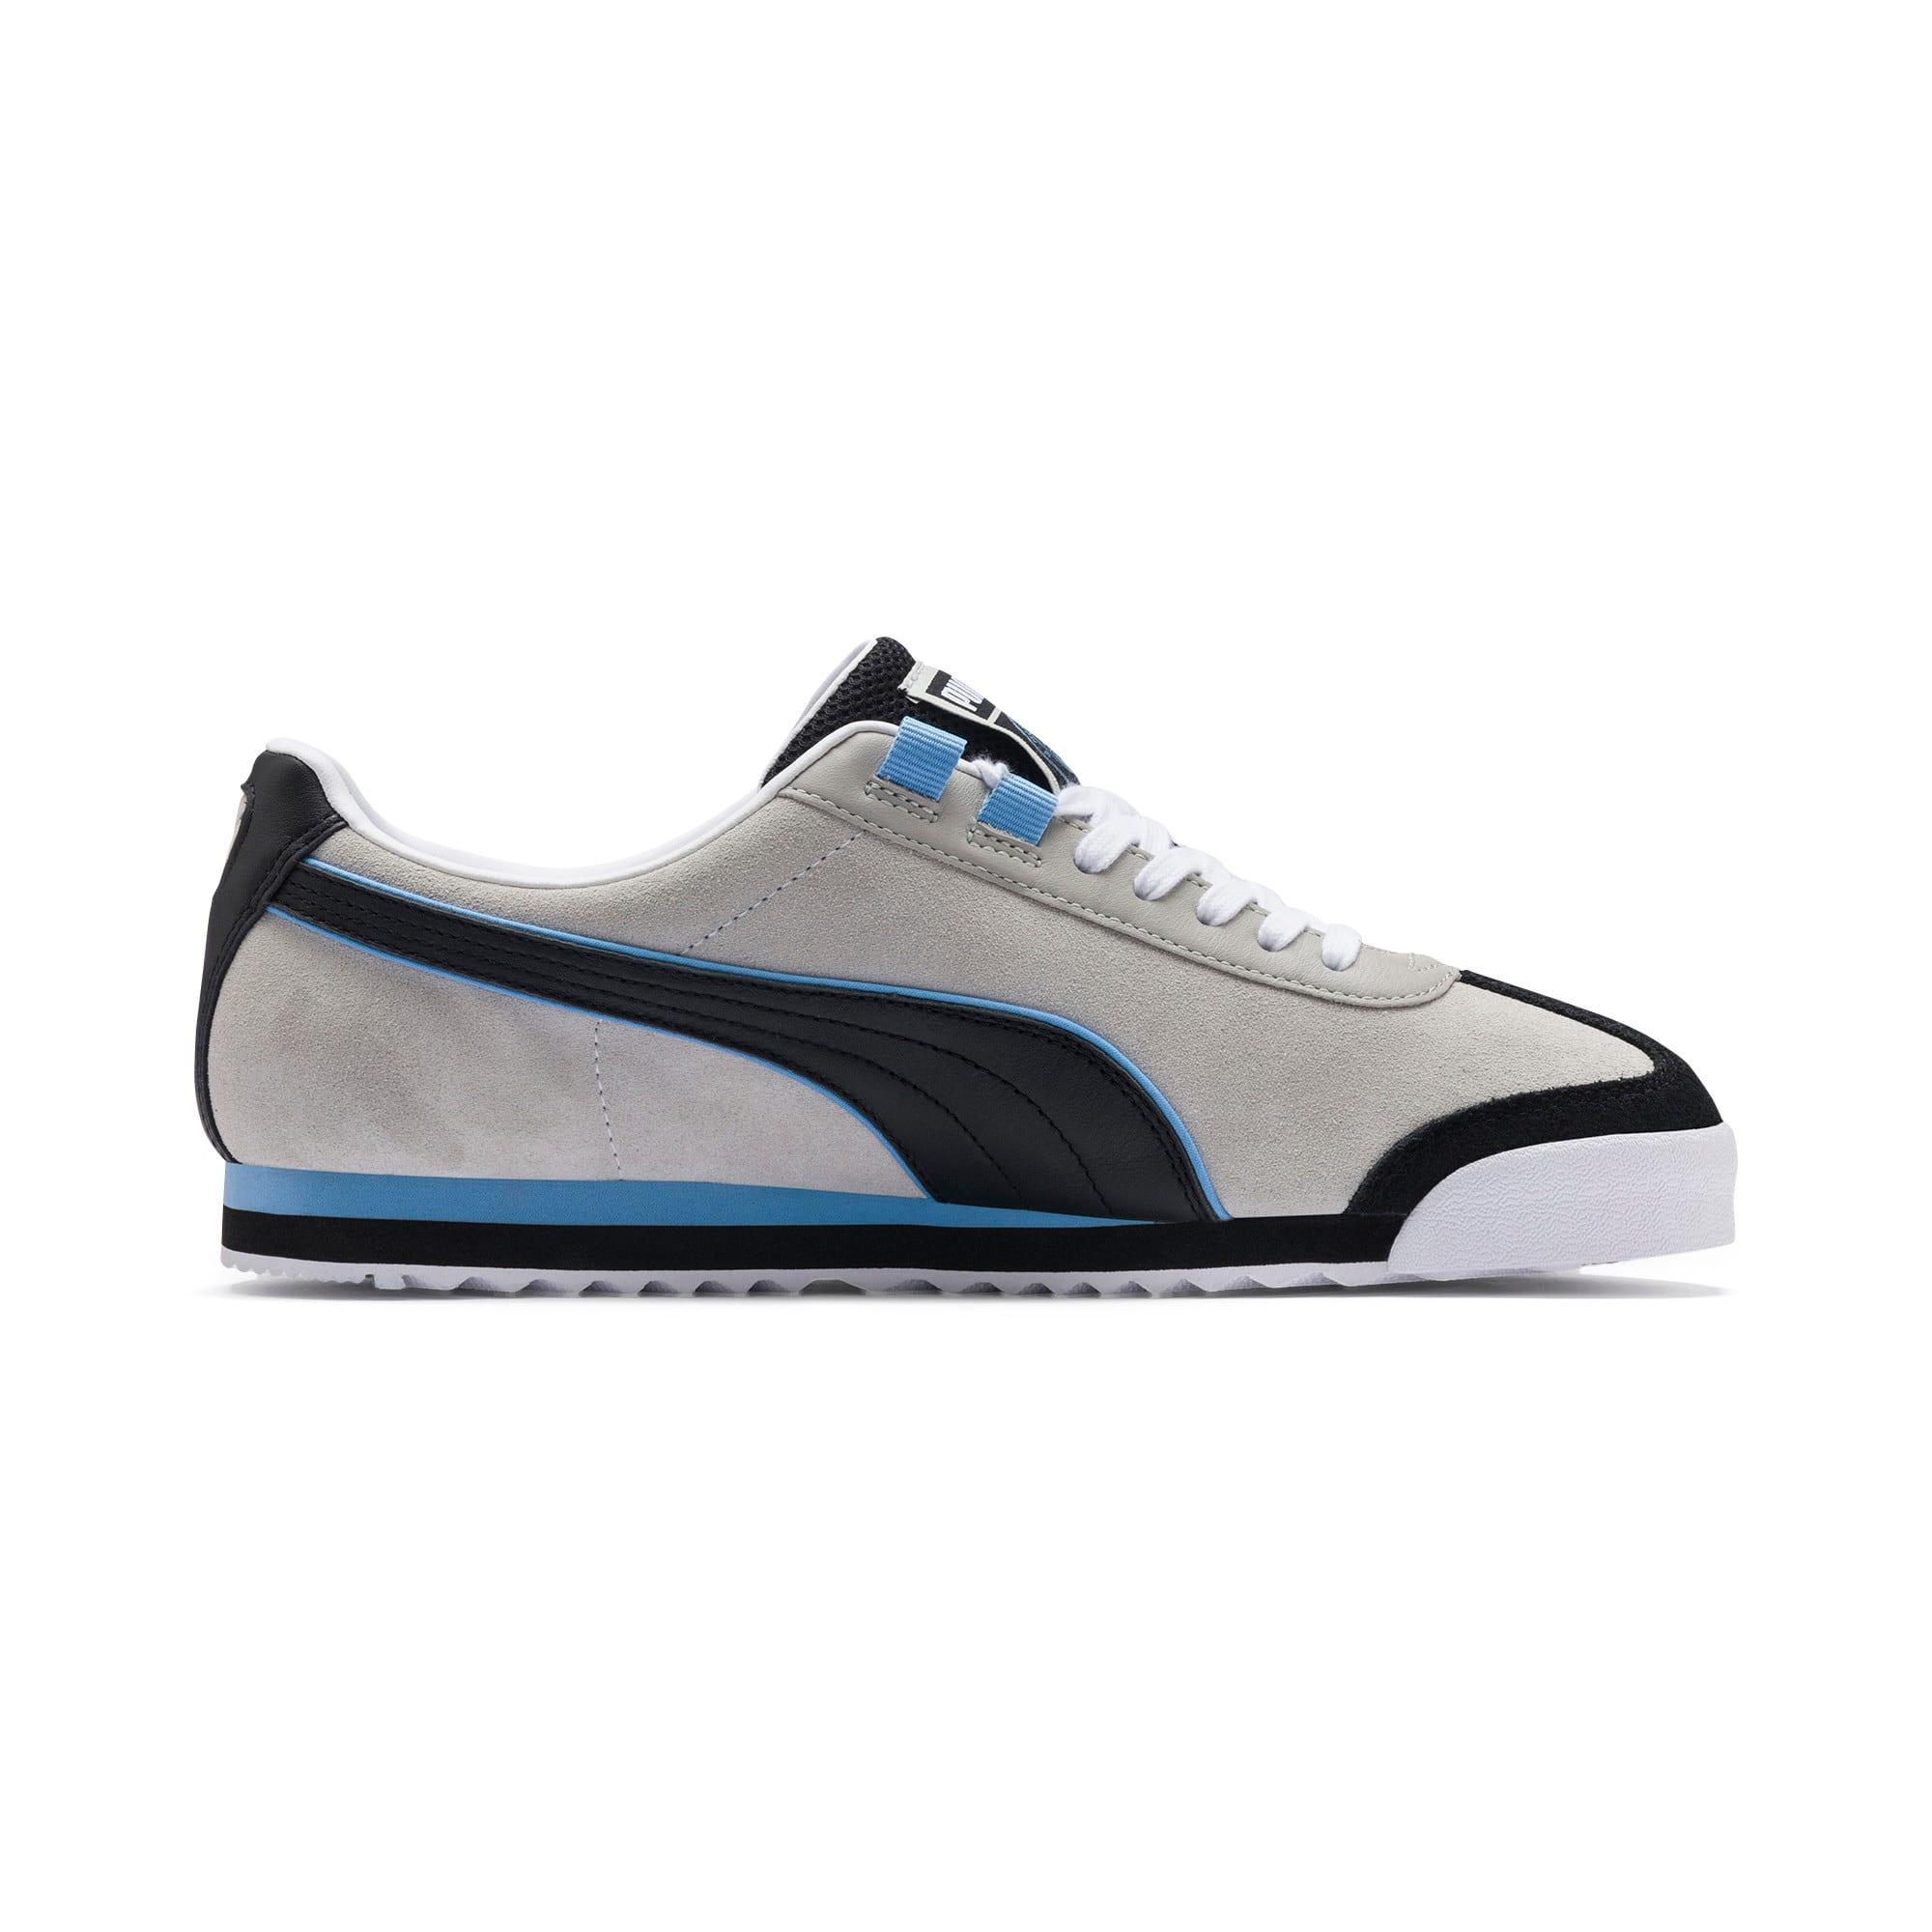 Thumbnail 5 of Roma Manchester City Men's Sneakers, Gray Violet-Team Light Blue, medium